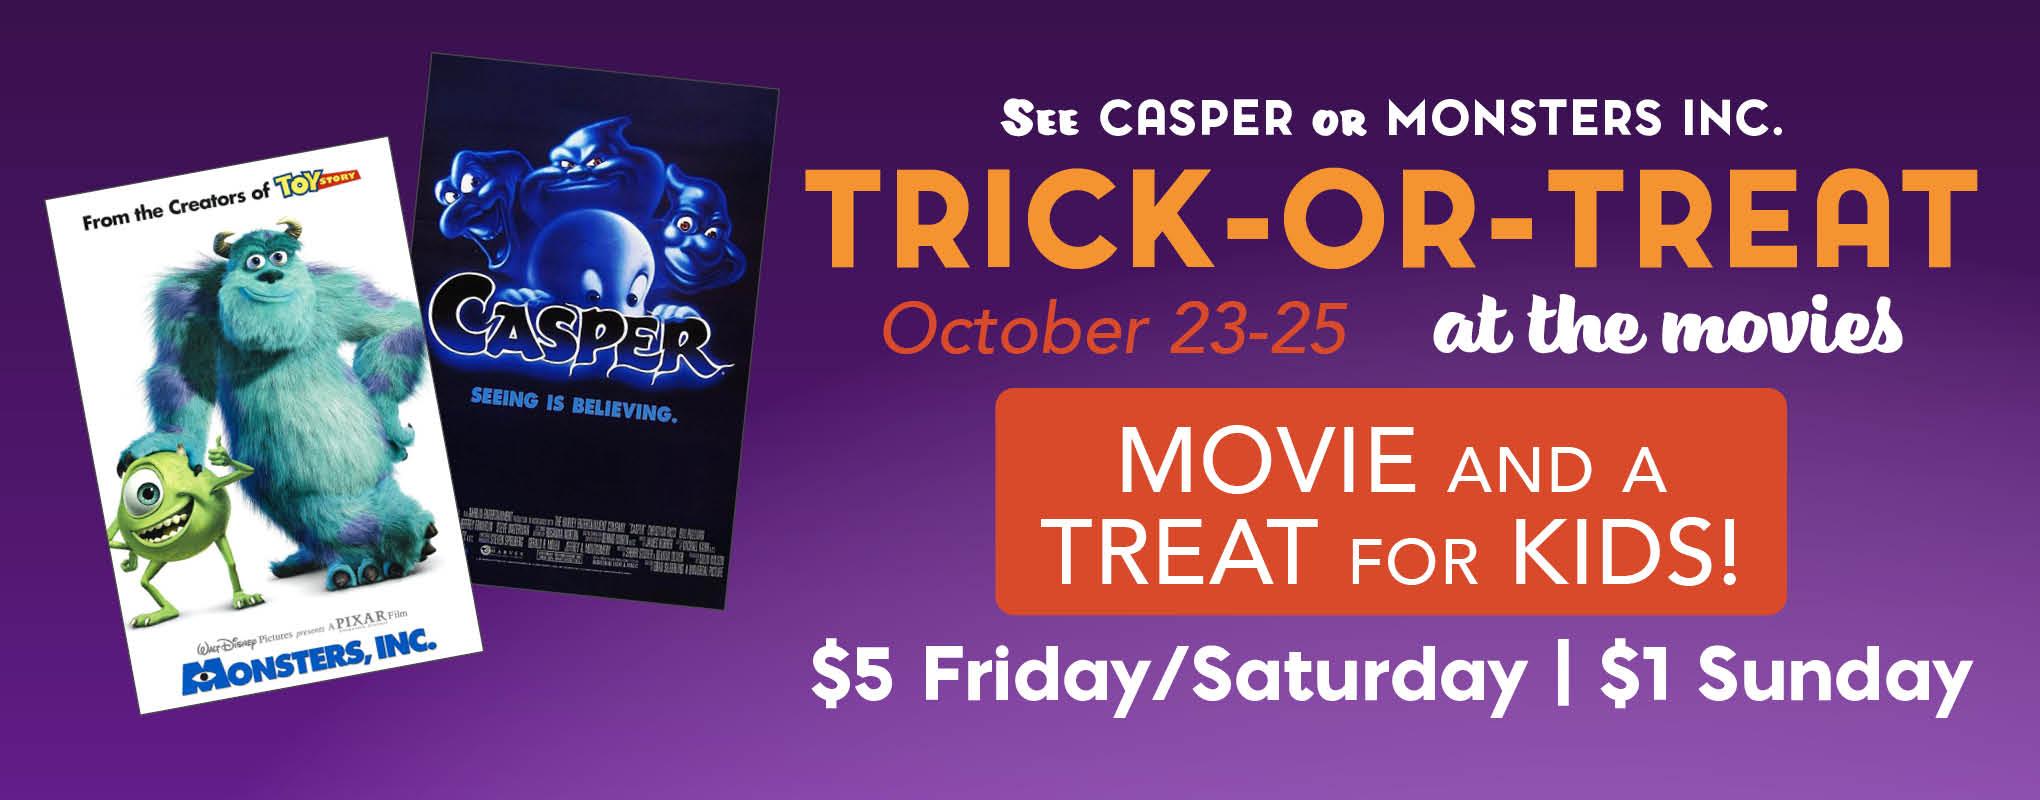 Omaha Midtown Halloween 2020 Omaha Movie Theatre | Marcus Theatres